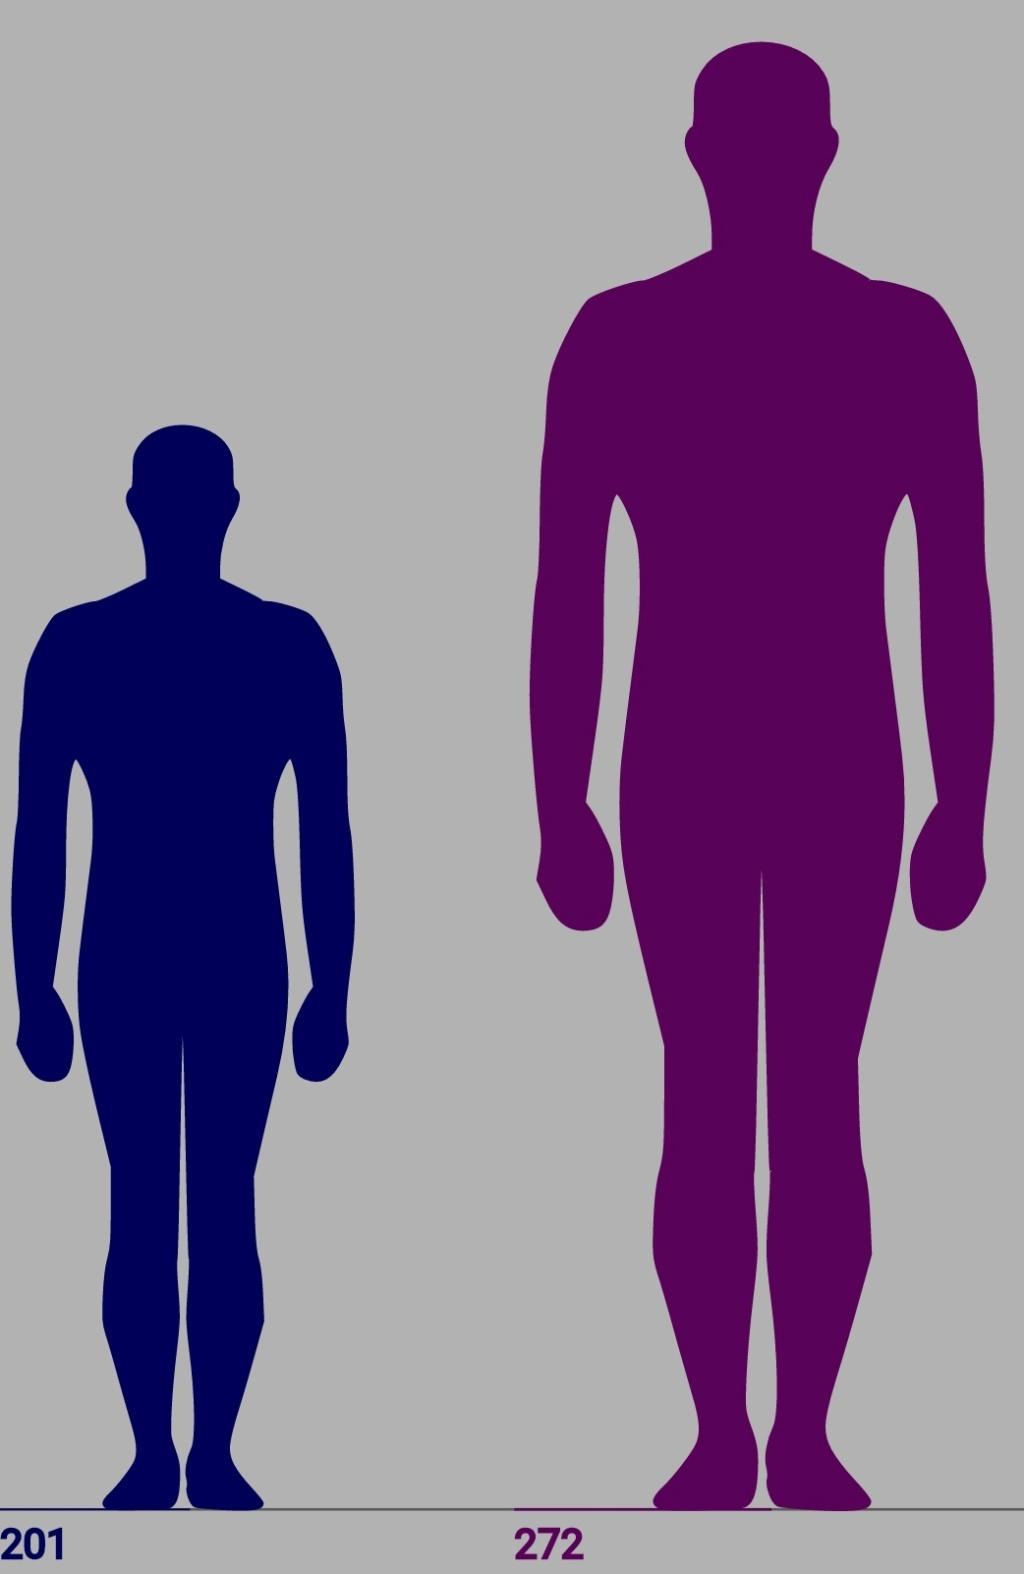 ¿Cuánto mide Robert Wadlow? - Altura - Real height - Página 2 Screen13